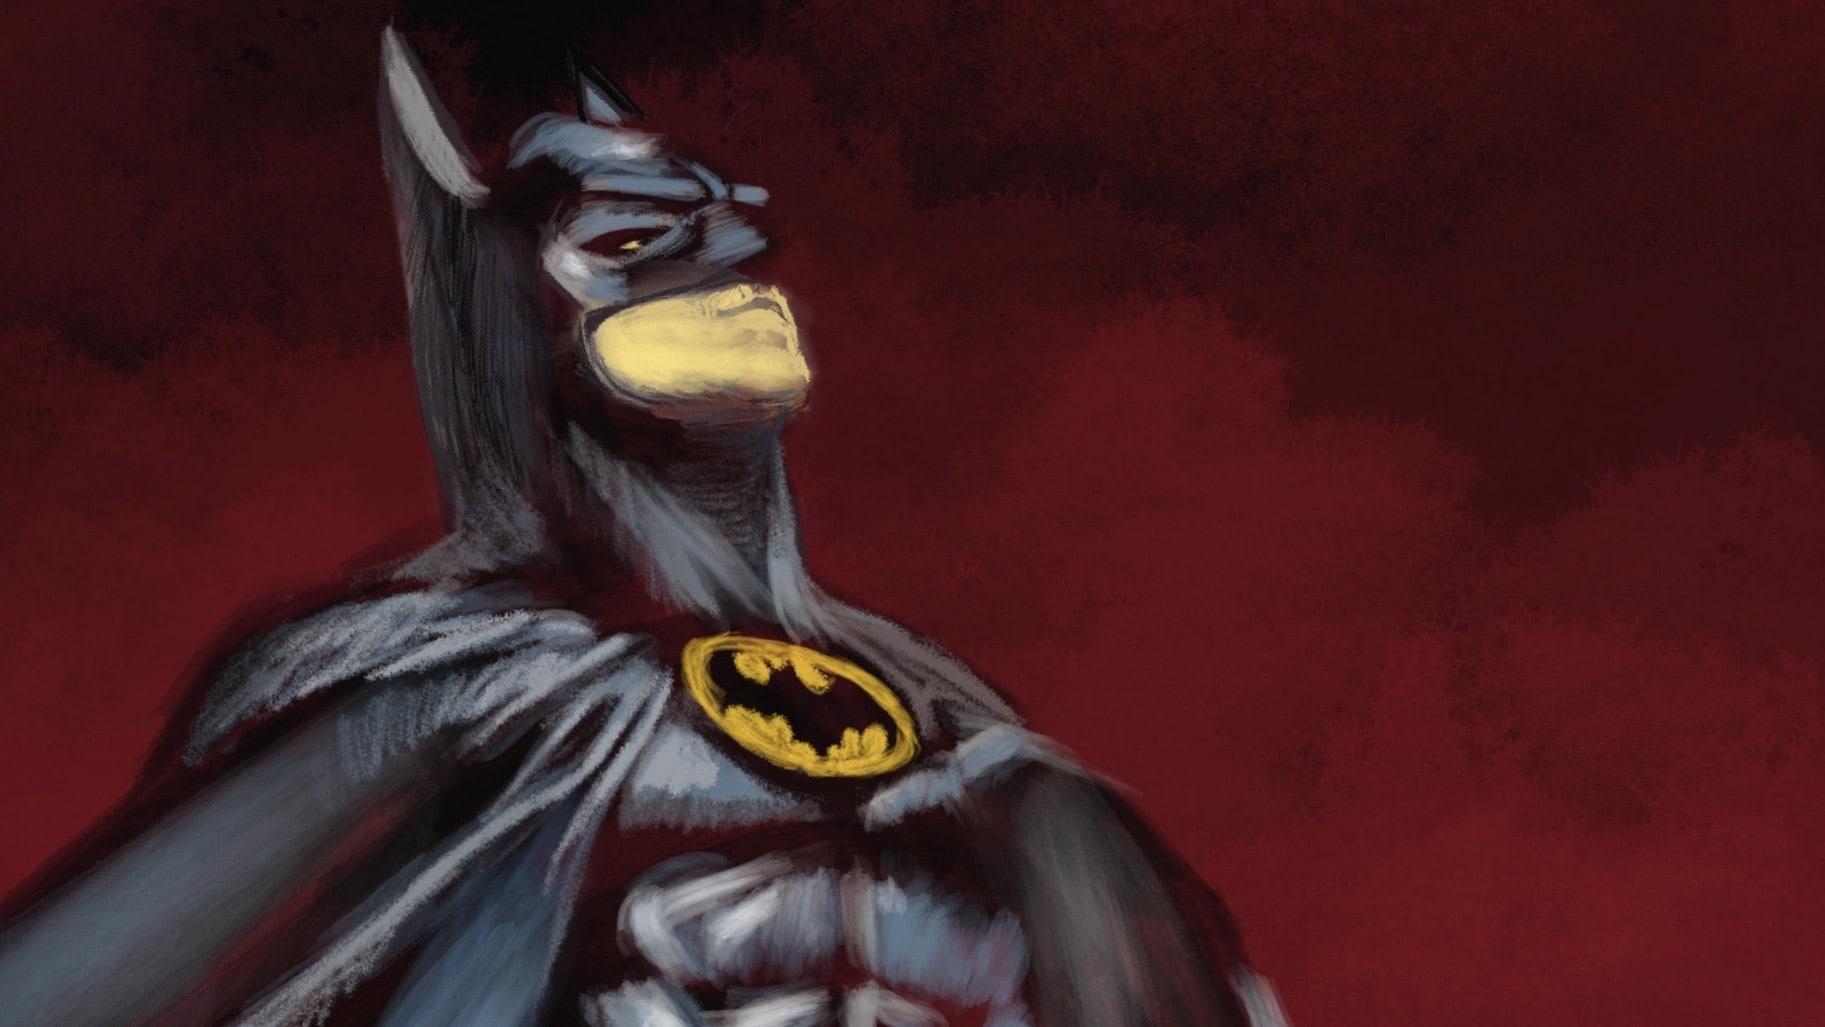 Batman 89: Michael Keaton Procreate Painting Tutorial – Part 1